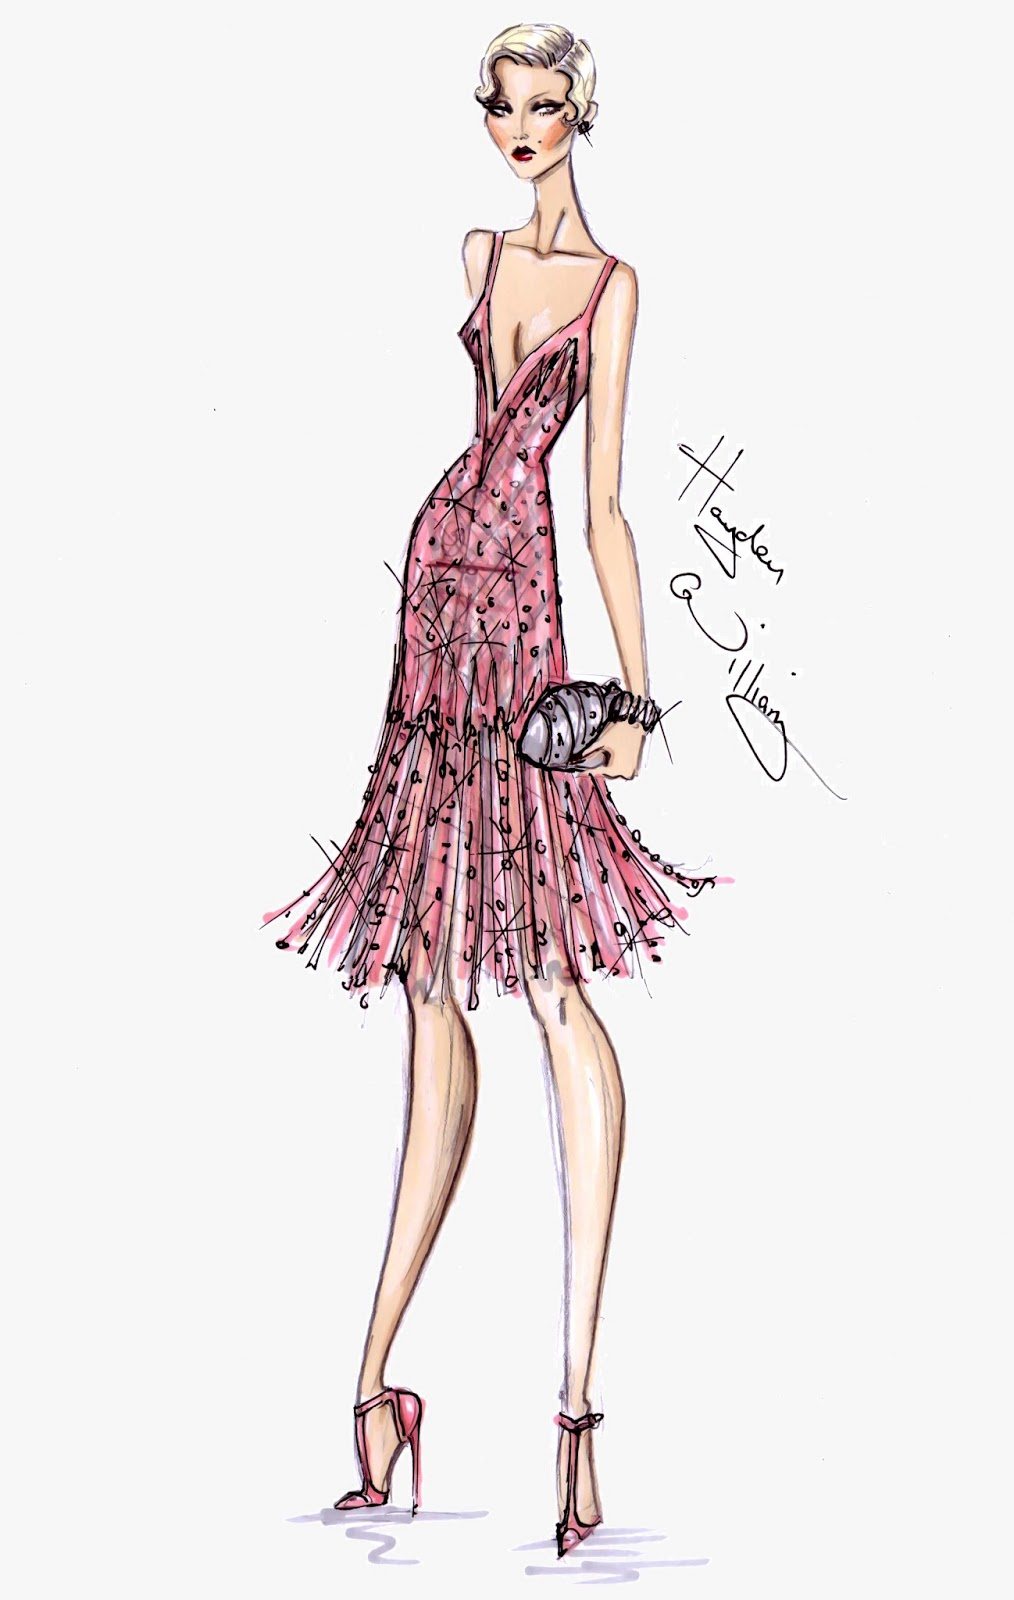 Hayden Williams Fashion Illustrations: May 2013